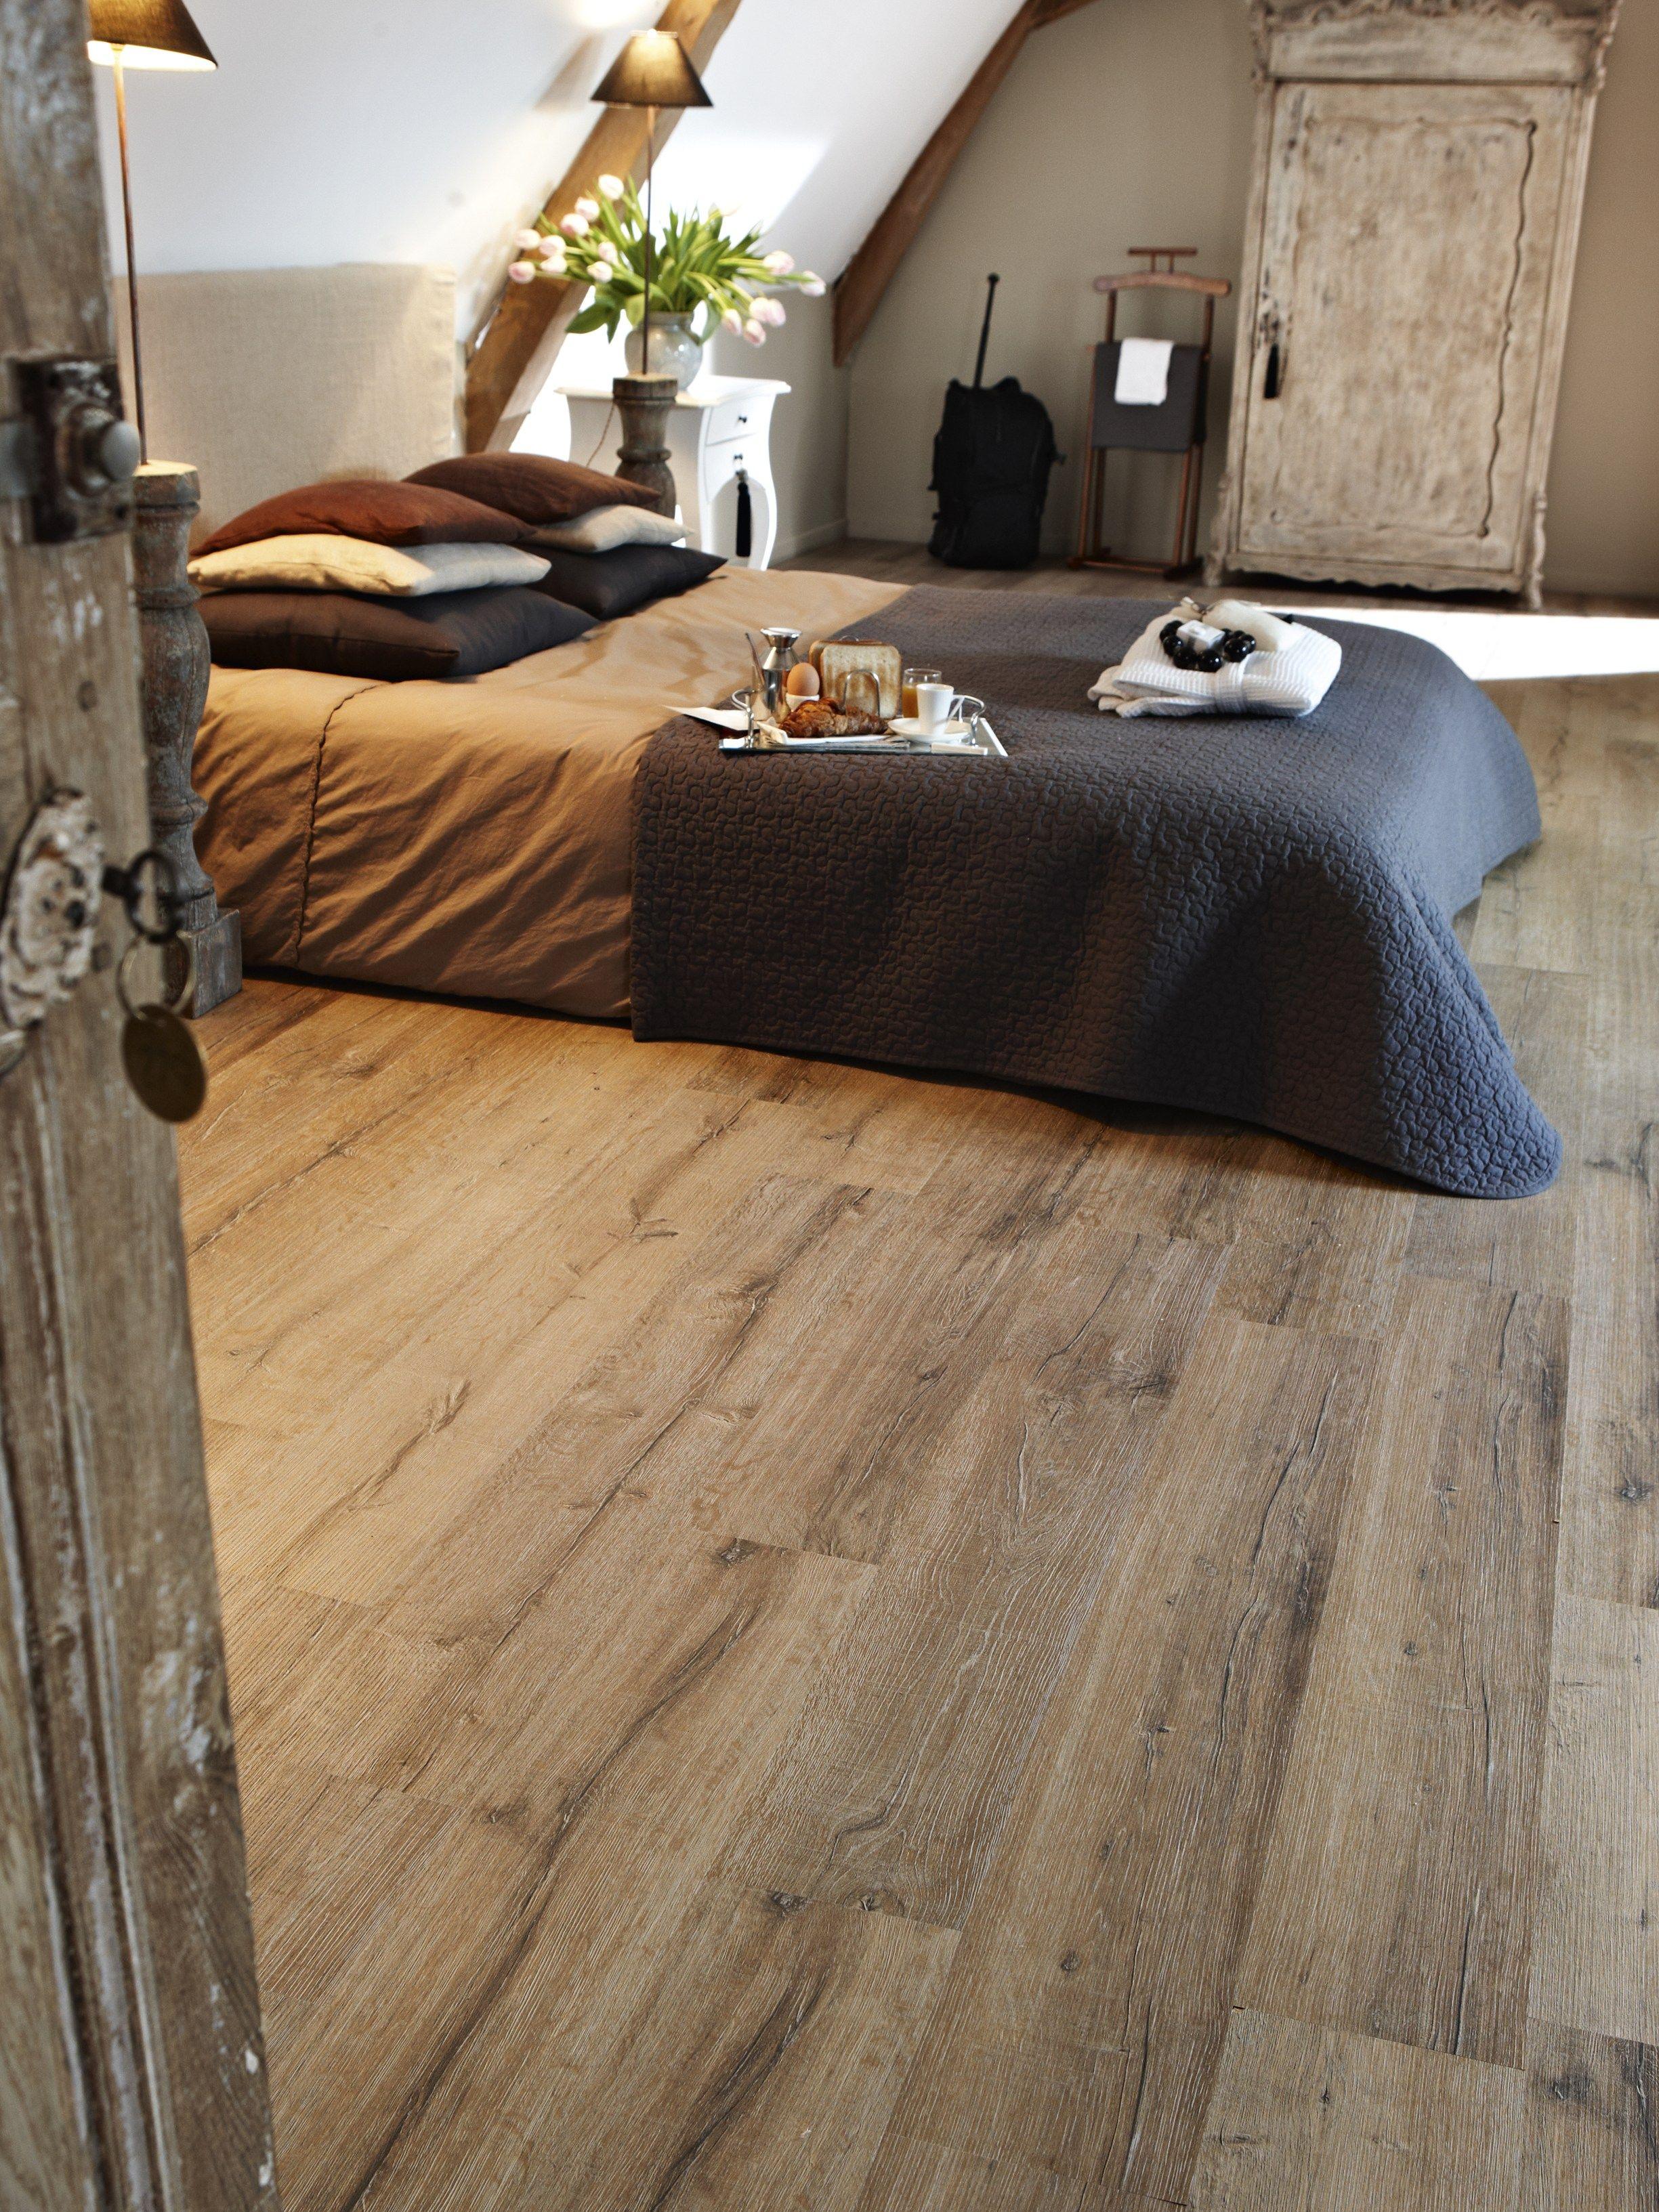 Pavimento en laminado imitaci n madera smart pro 832 by - Pavimento imitacion madera ...